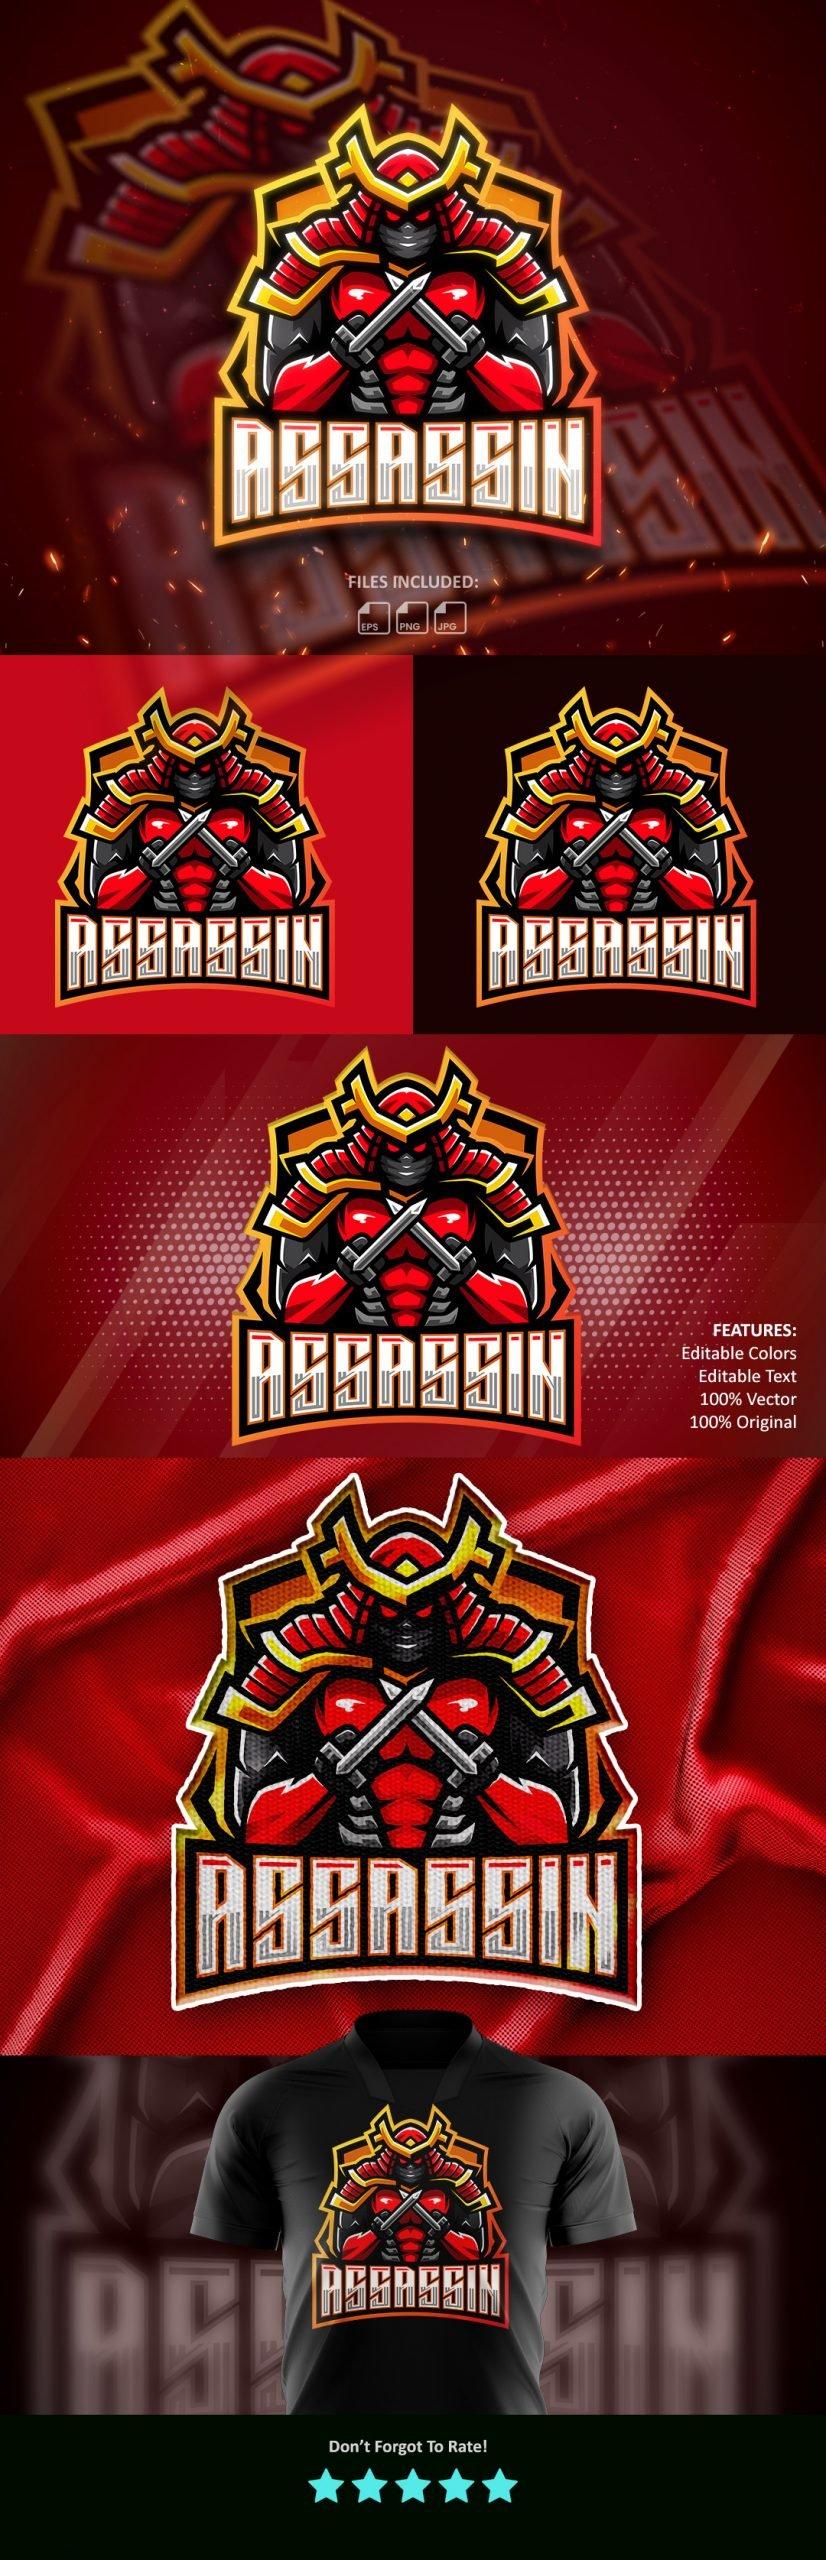 Free-Assassin-Esports-Gaming-Clan-Mascot-Logo-Free-Download